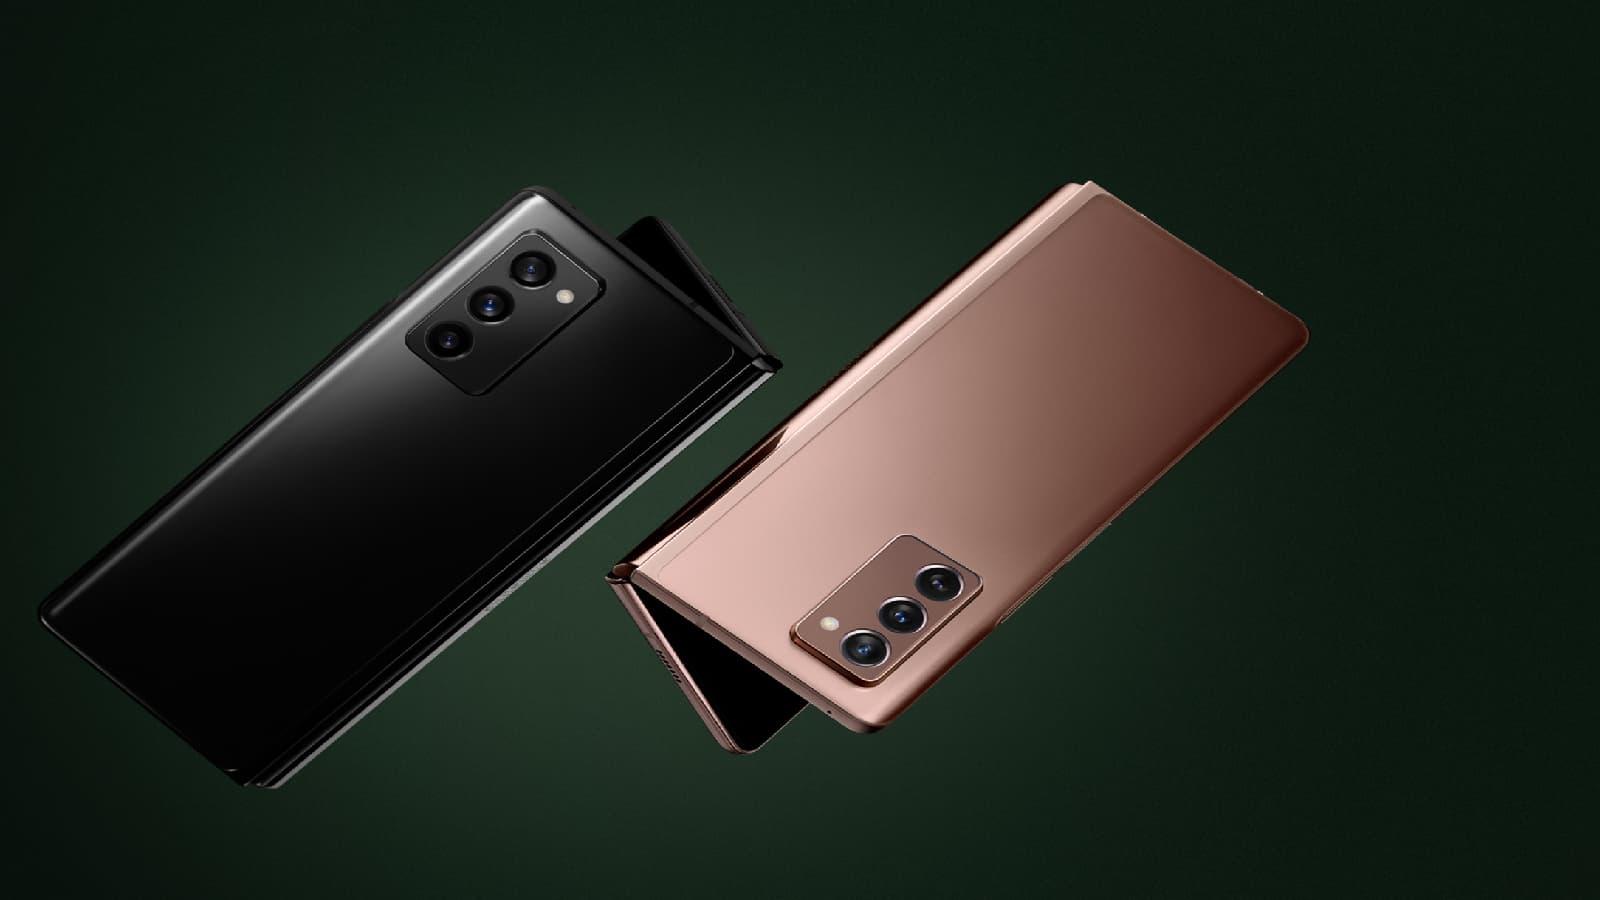 Le Samsung Galaxy Z Fold 2 est disponible chez SFR